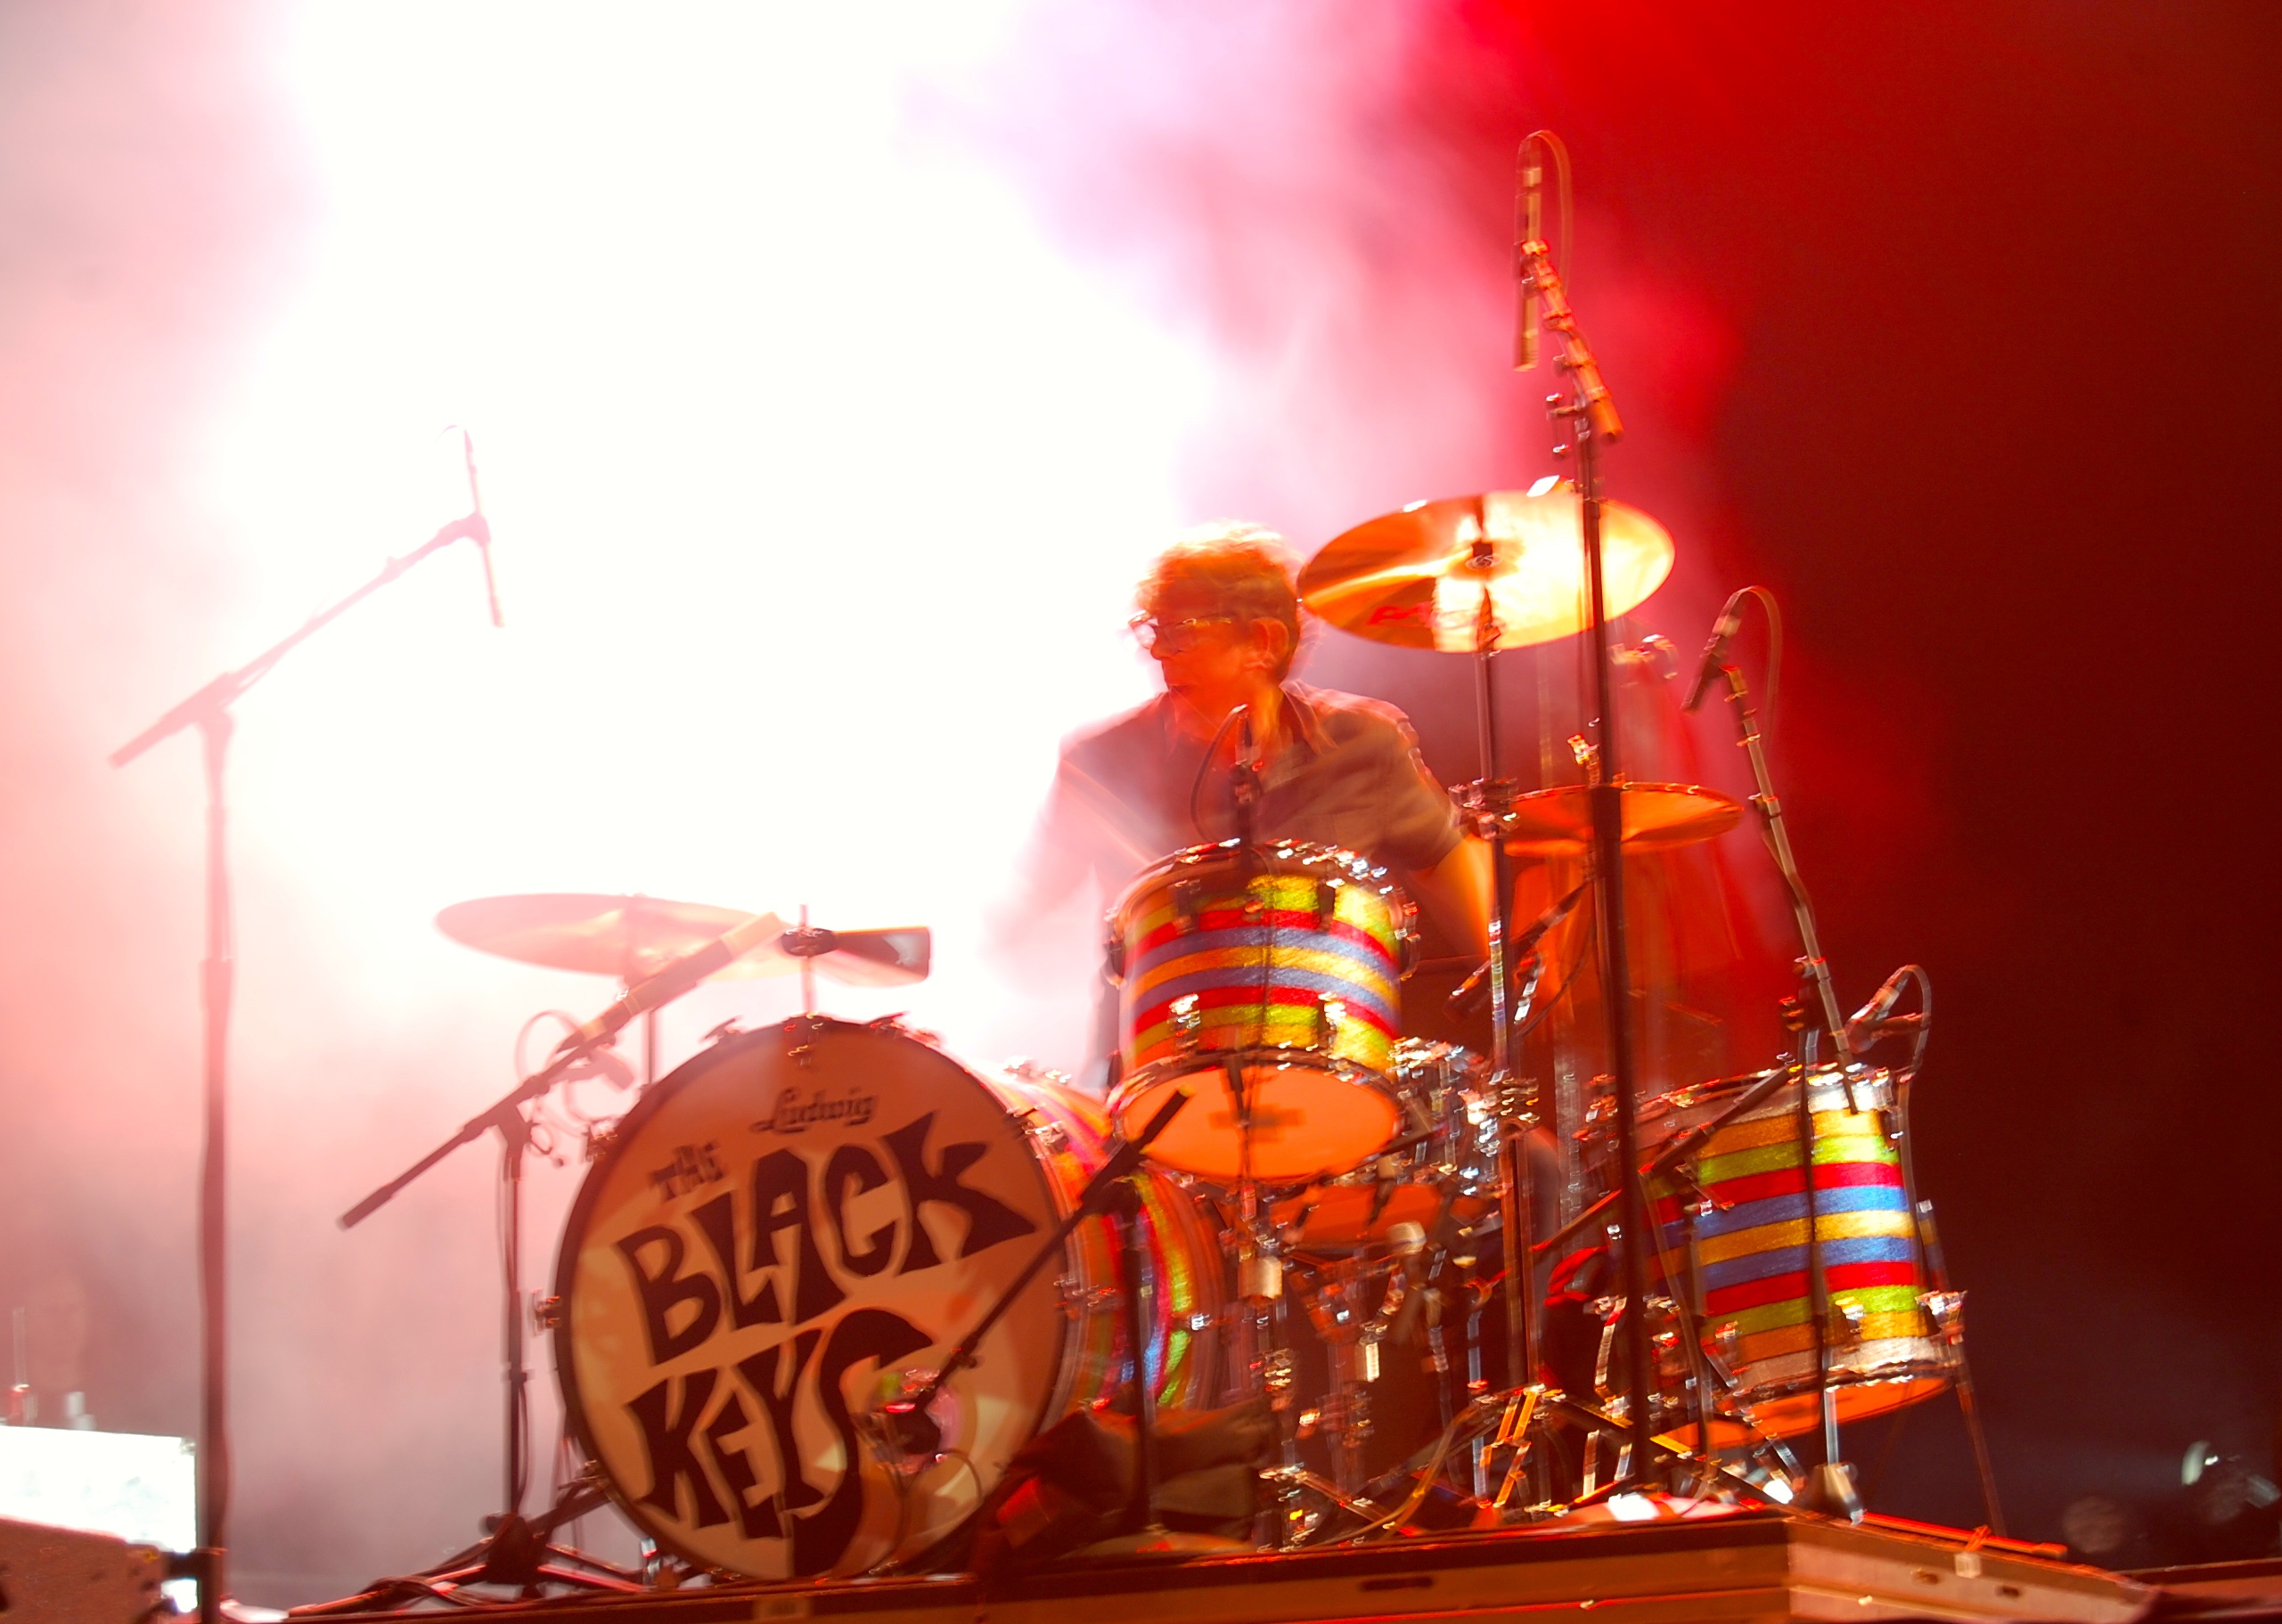 The Black Keys // Photo by Adam Kivel